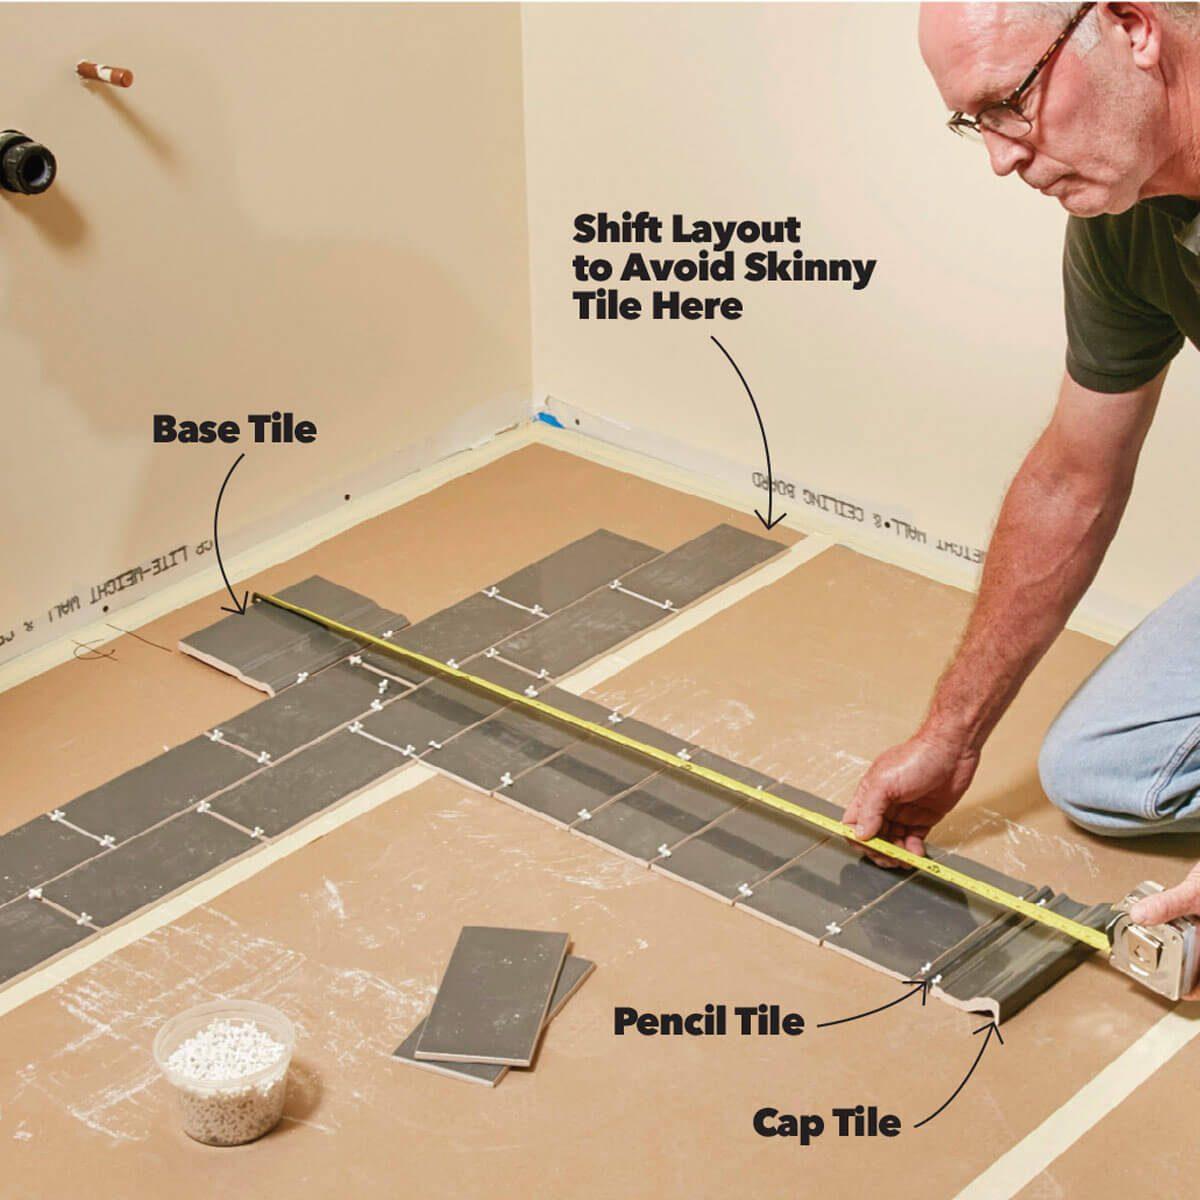 Master the Art of Subway Tile | The Family Handyman